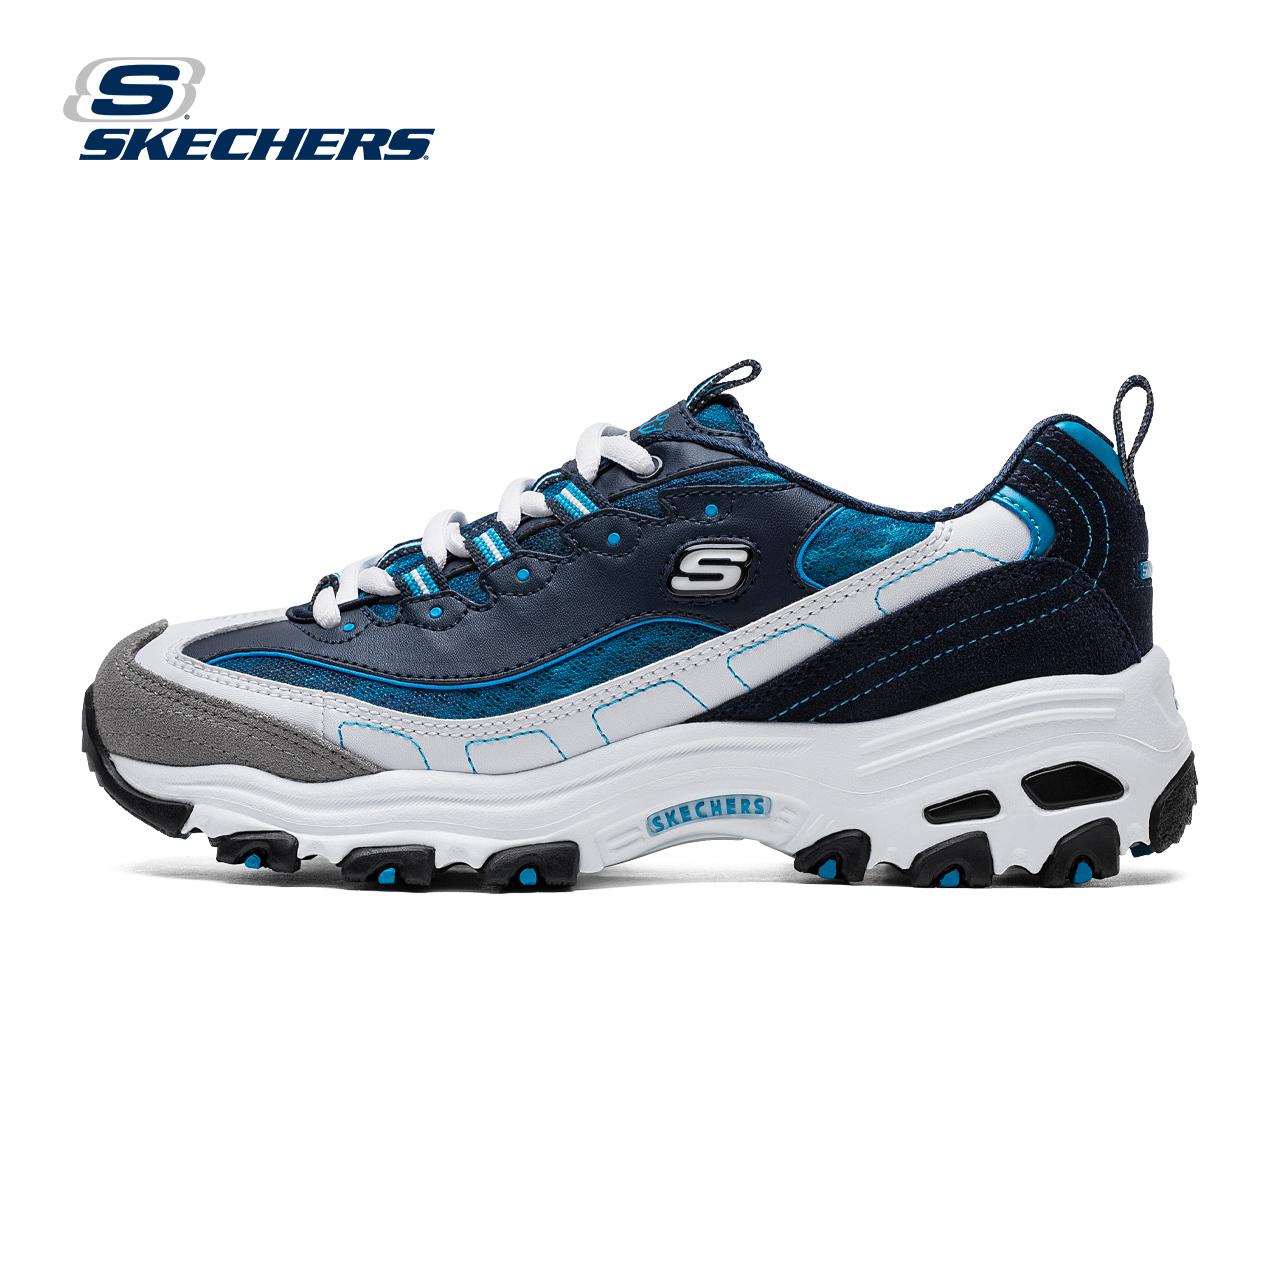 Skechers斯凱奇D rsquo lites 熊貓鞋 厚底情侶 鞋99999956